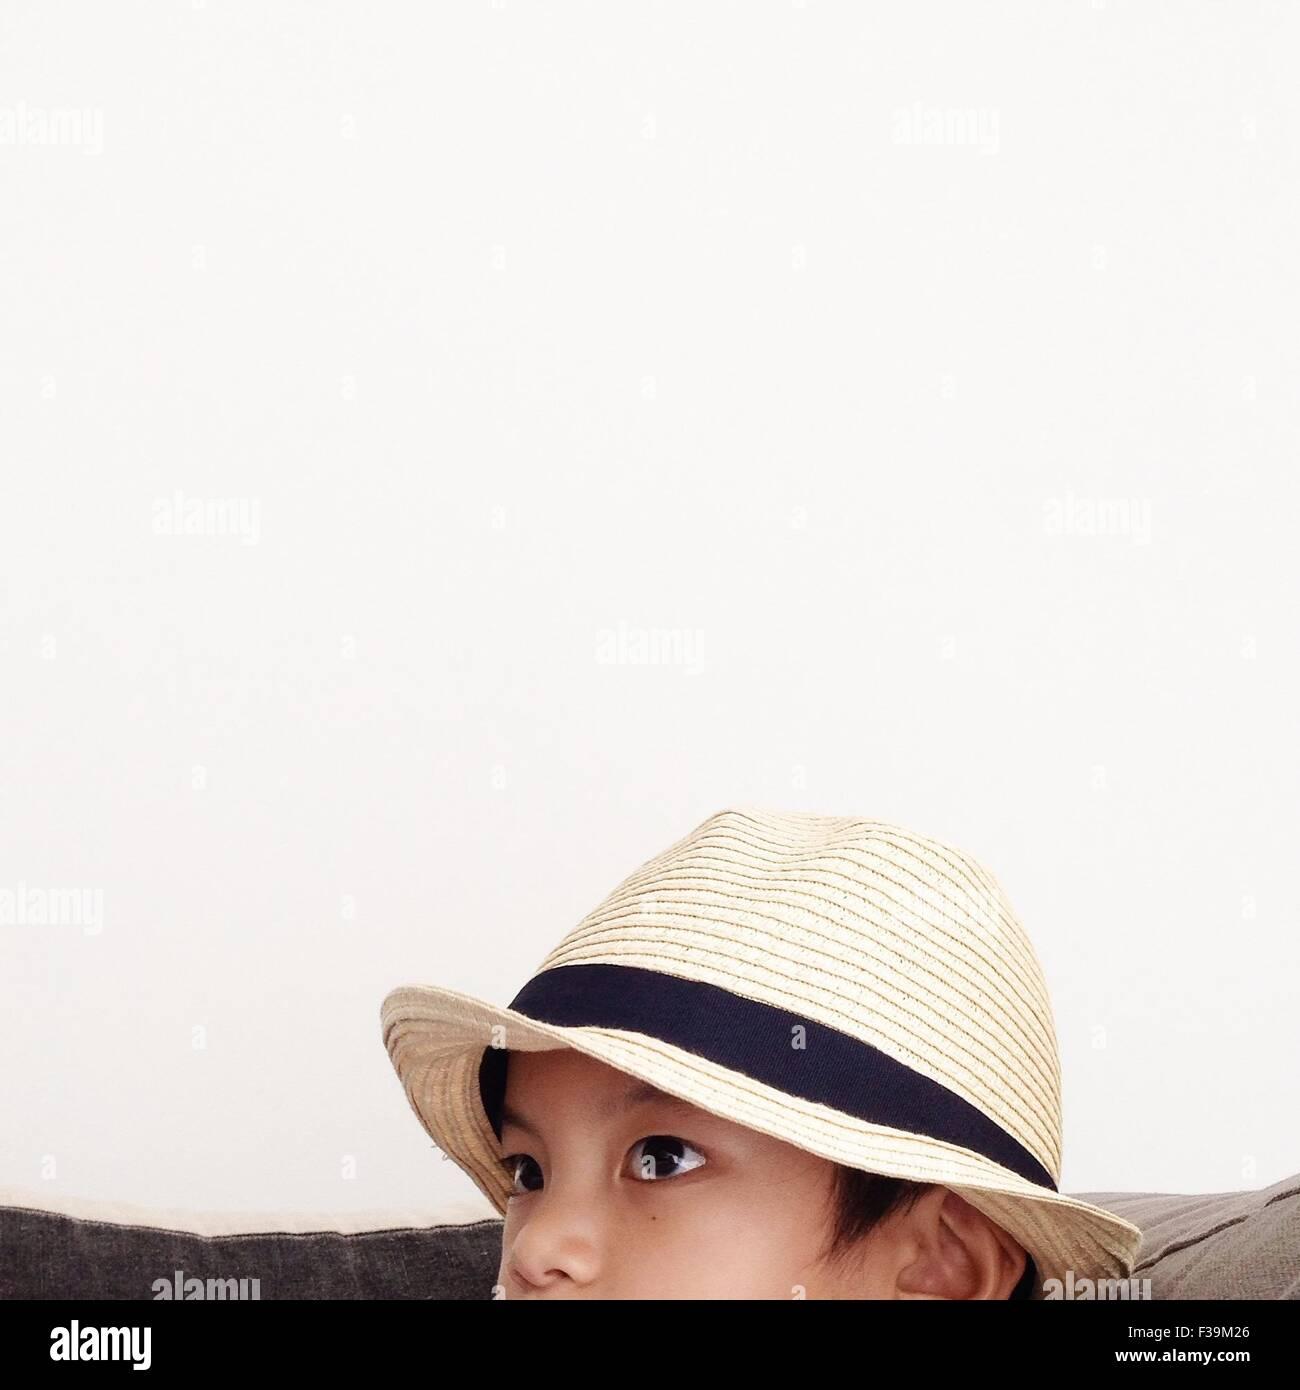 Portrait of a boy wearing straw hat - Stock Image